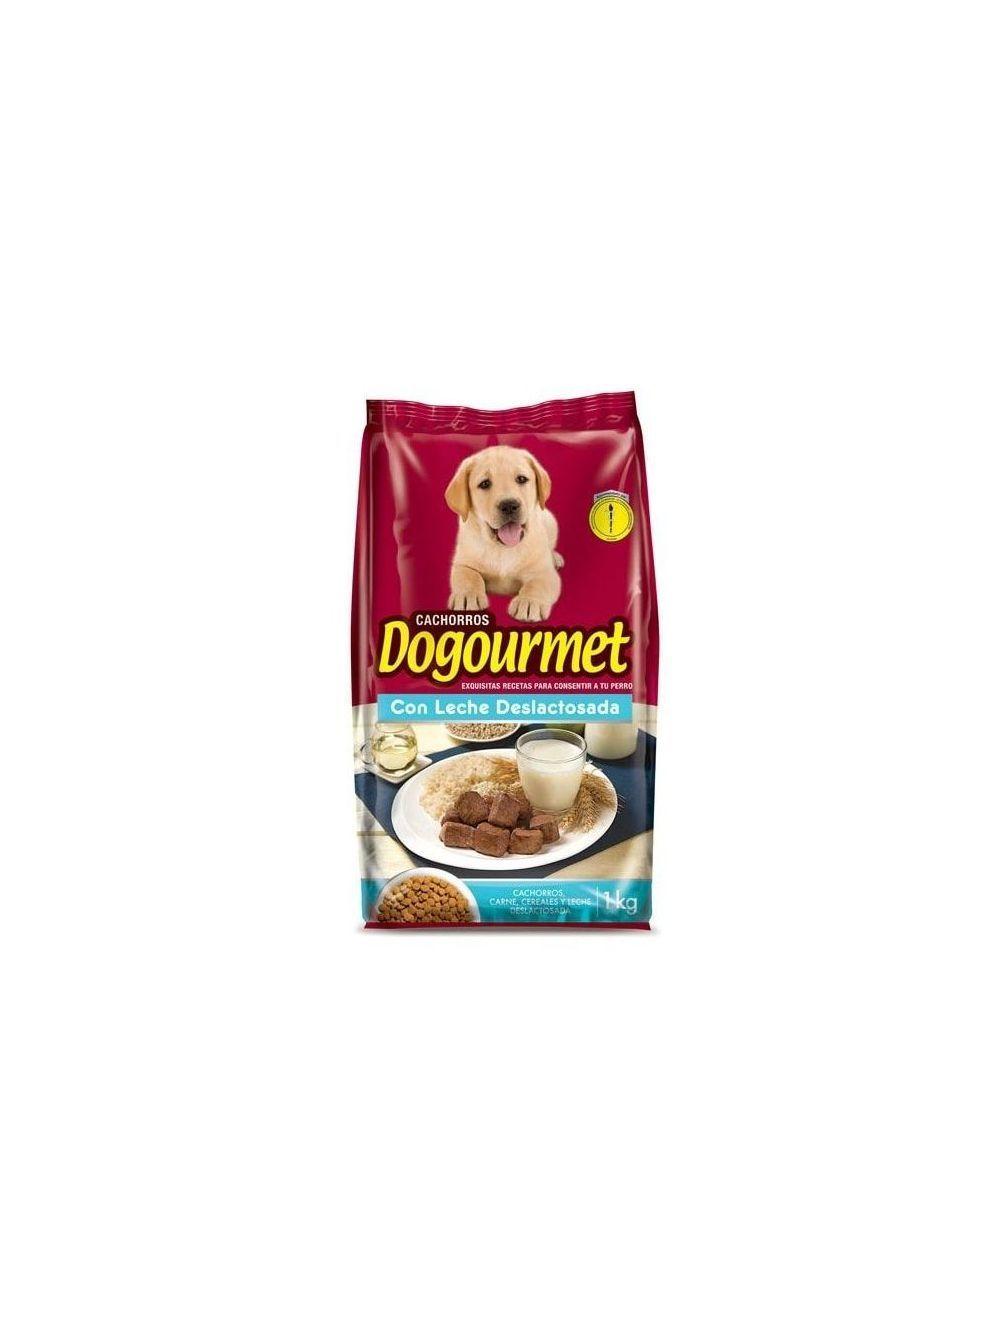 Dogourmet Cachorros Leche Deslactosada 16 Kg